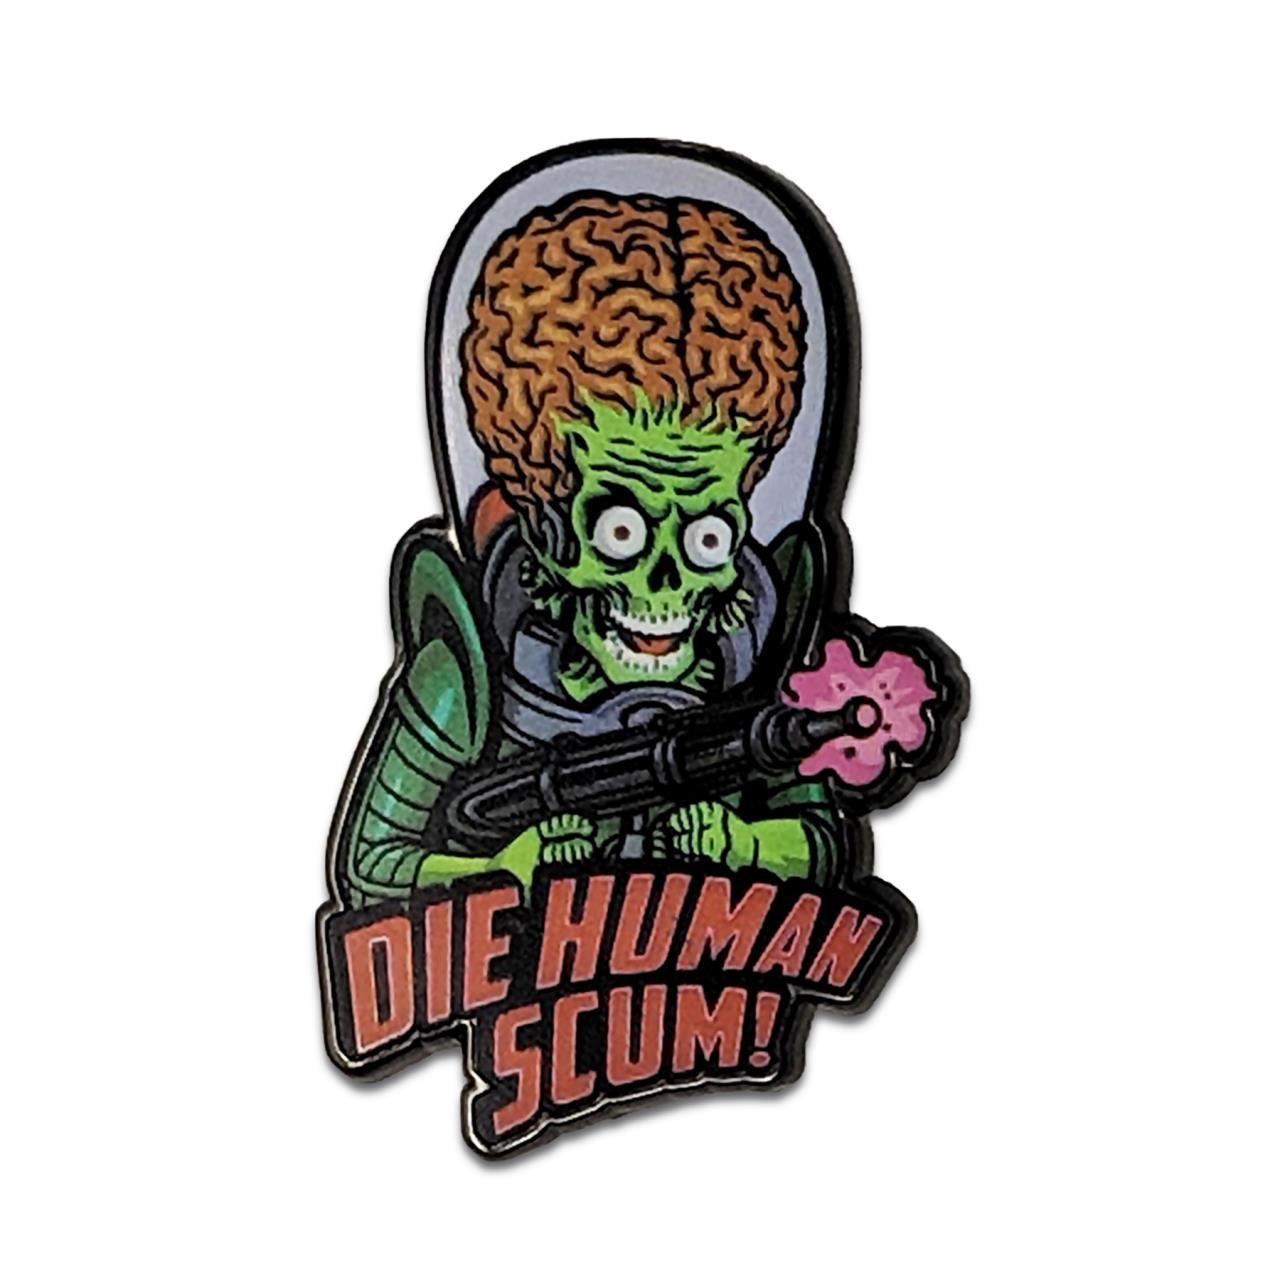 Mars Attacks Human Scum Pin* -